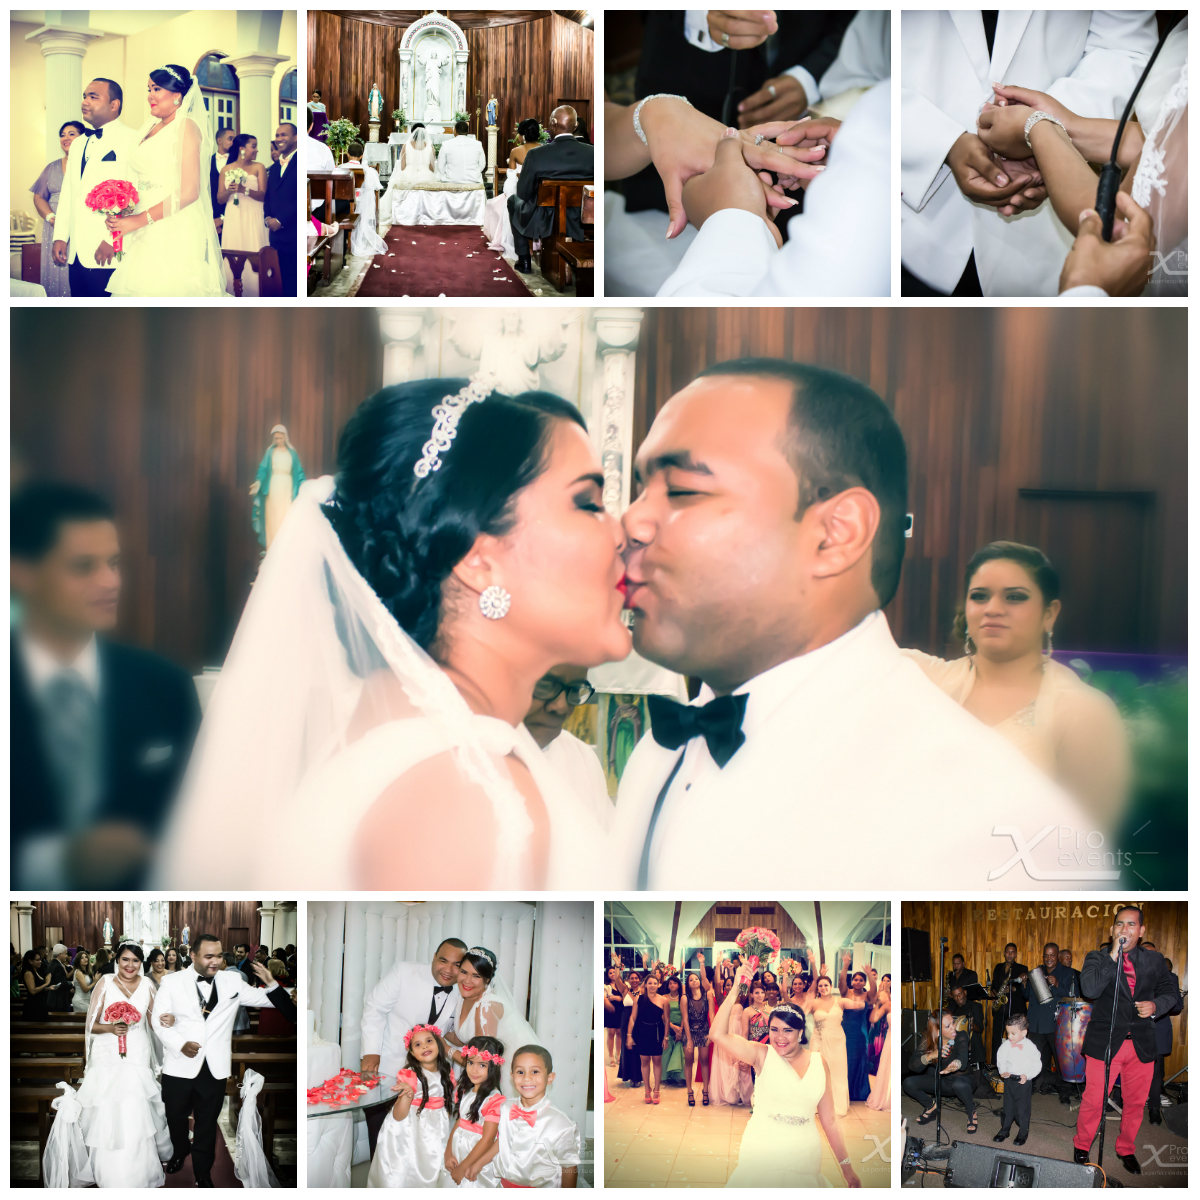 www.Xproevents.com - Collage de la boda de Jonathan & Alexandra.jpg